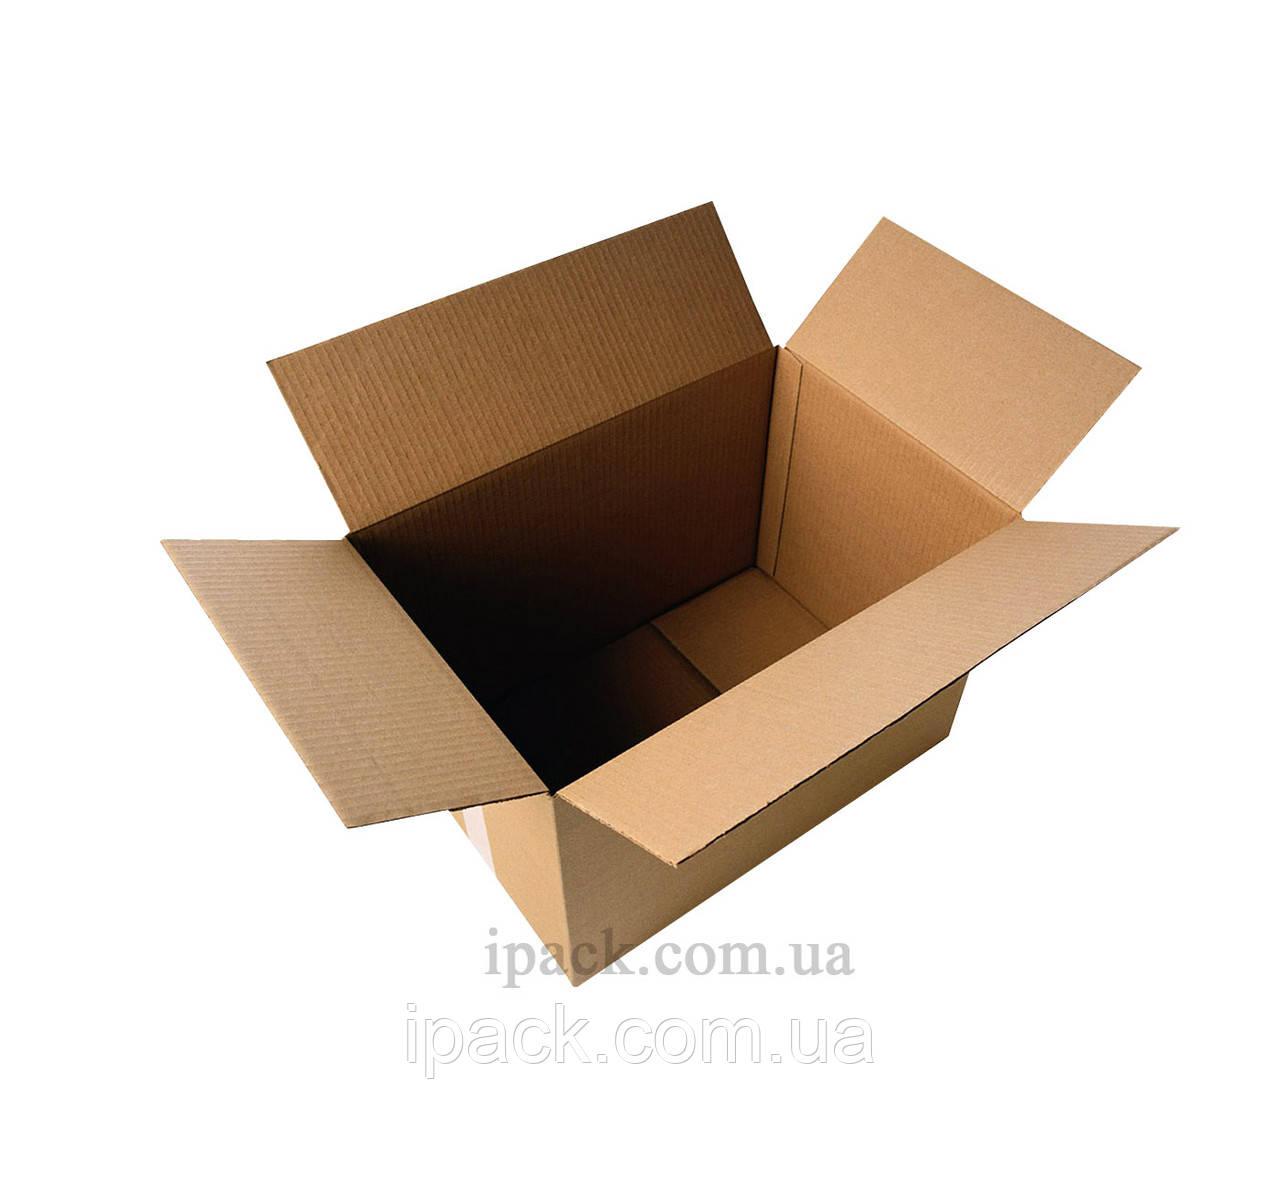 Гофроящик 280*150*240 мм, бурый, четырехклапанный картонный короб